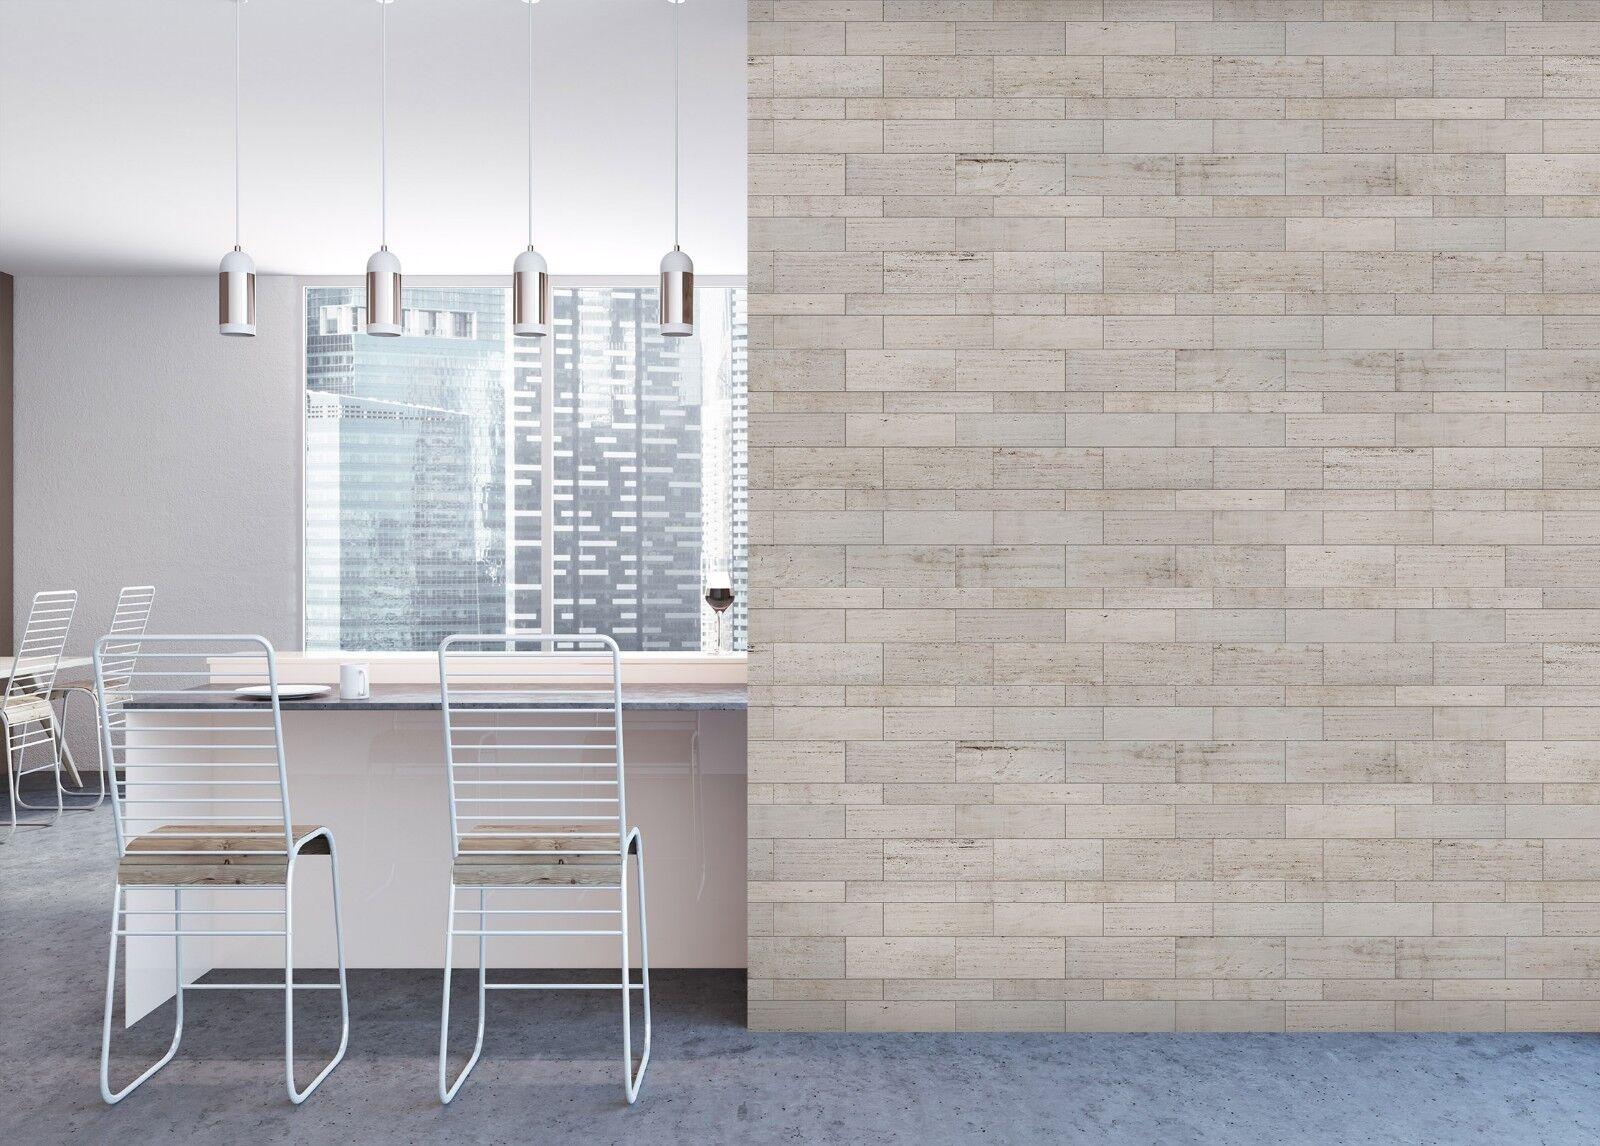 3D Retro Grey Wall 3 Texture Tiles Marble Wall Paper Decal Wallpaper Mural AJ UK